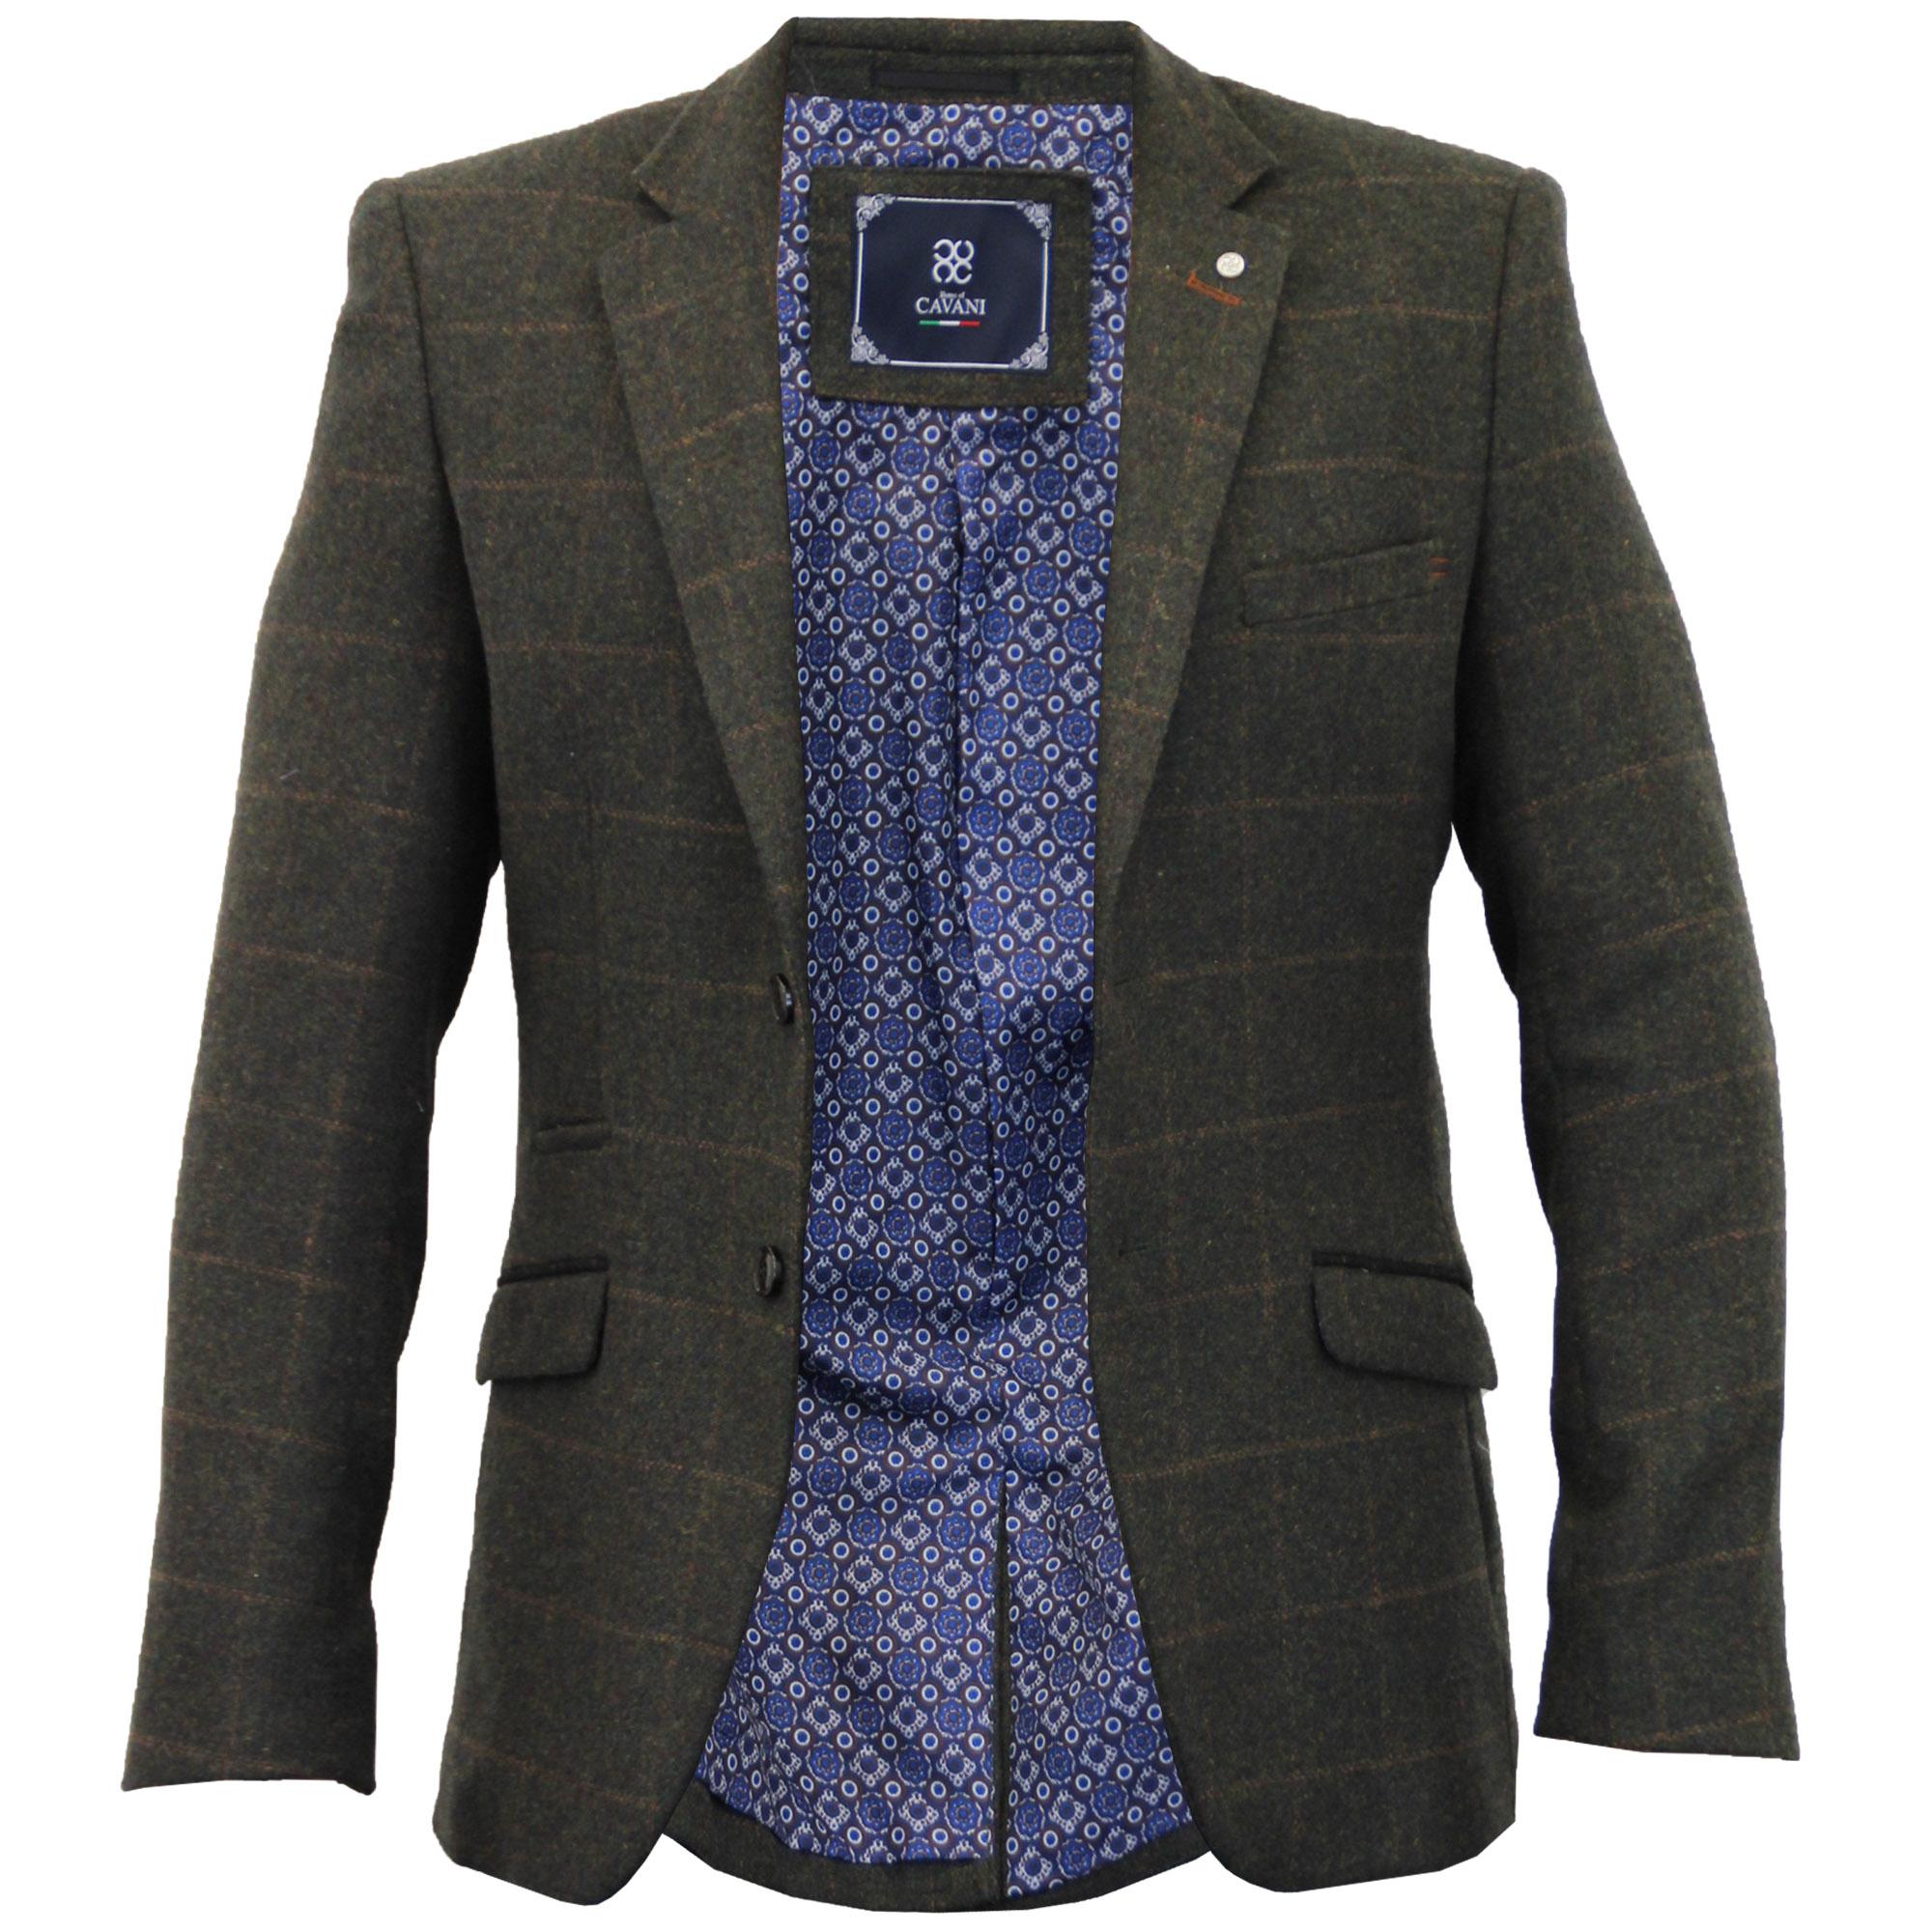 Mens Blazer Cavani Coat Wool Mix Checked Suit Jacket Slim Fit Formal Wedding New